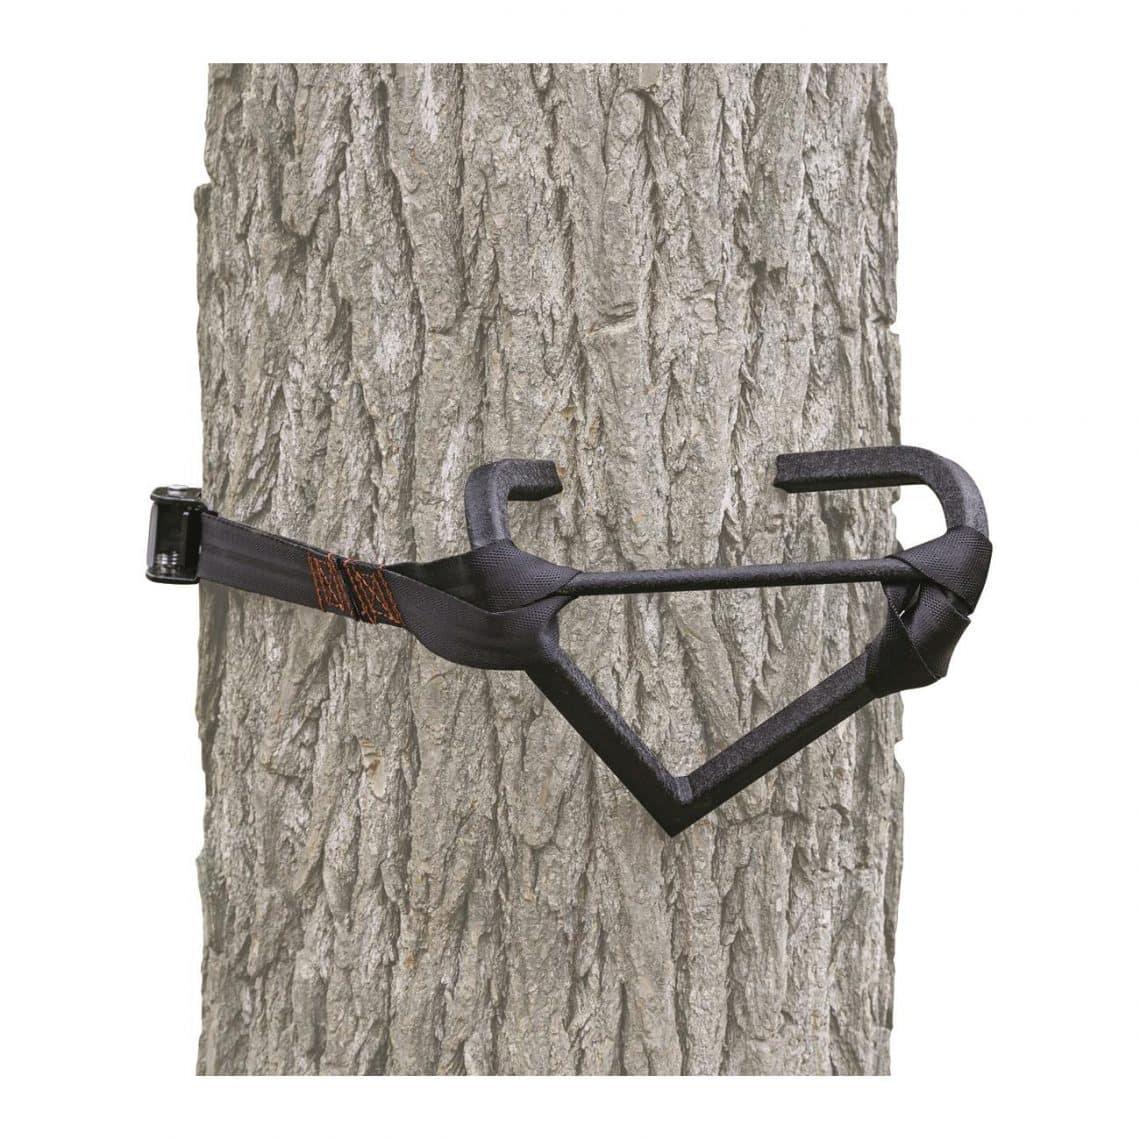 Primal Hunting Strap On V Tree Step Northwoods Wholesale